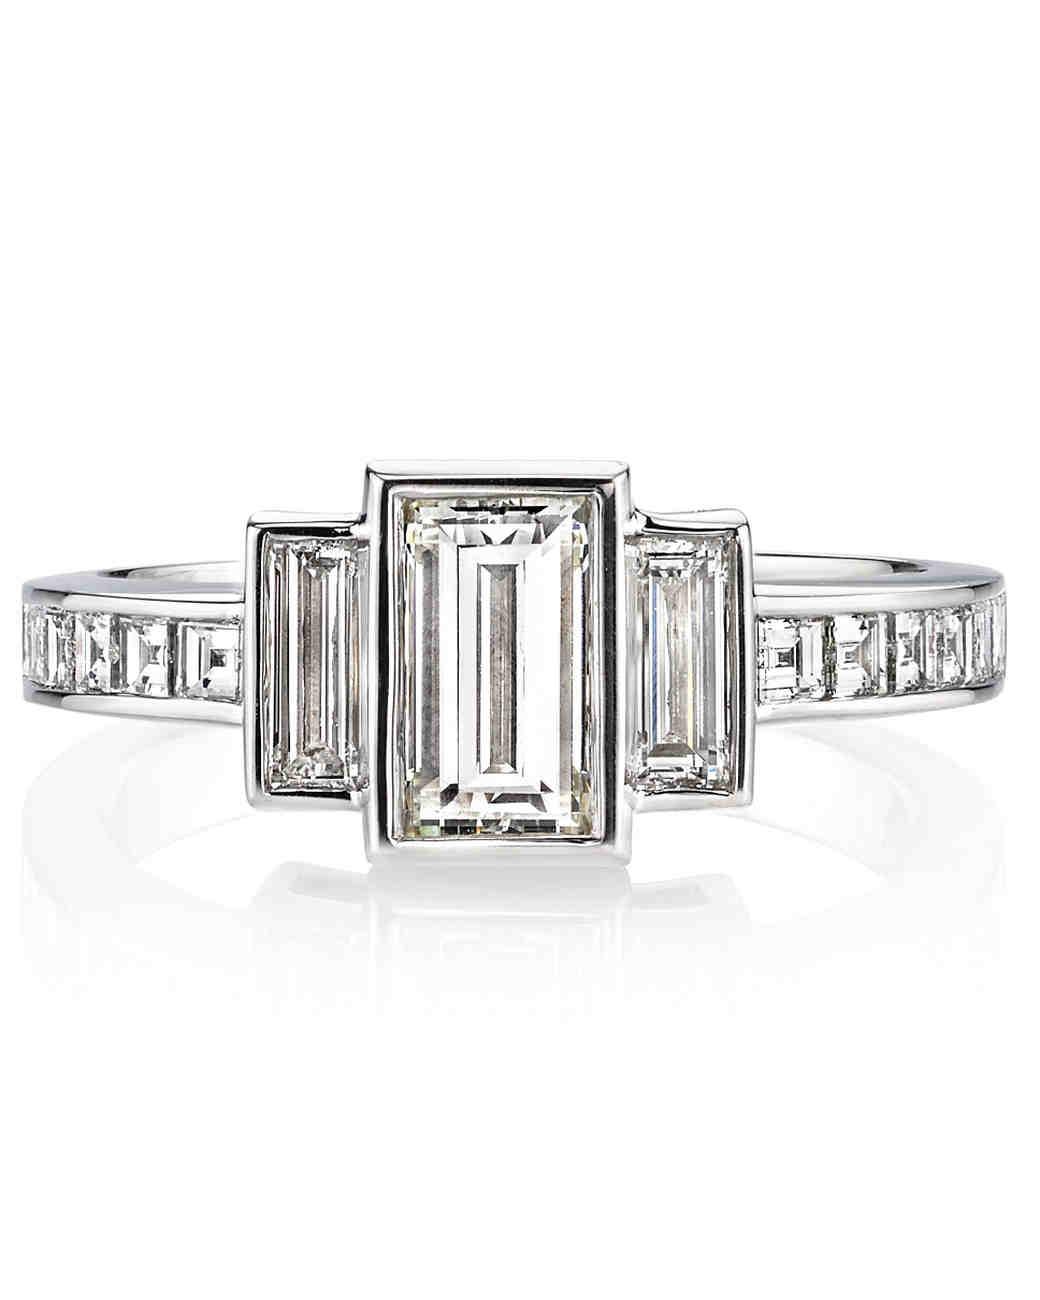 elegant emerald cut engagement rings martha stewart weddings - Emerald Cut Wedding Rings